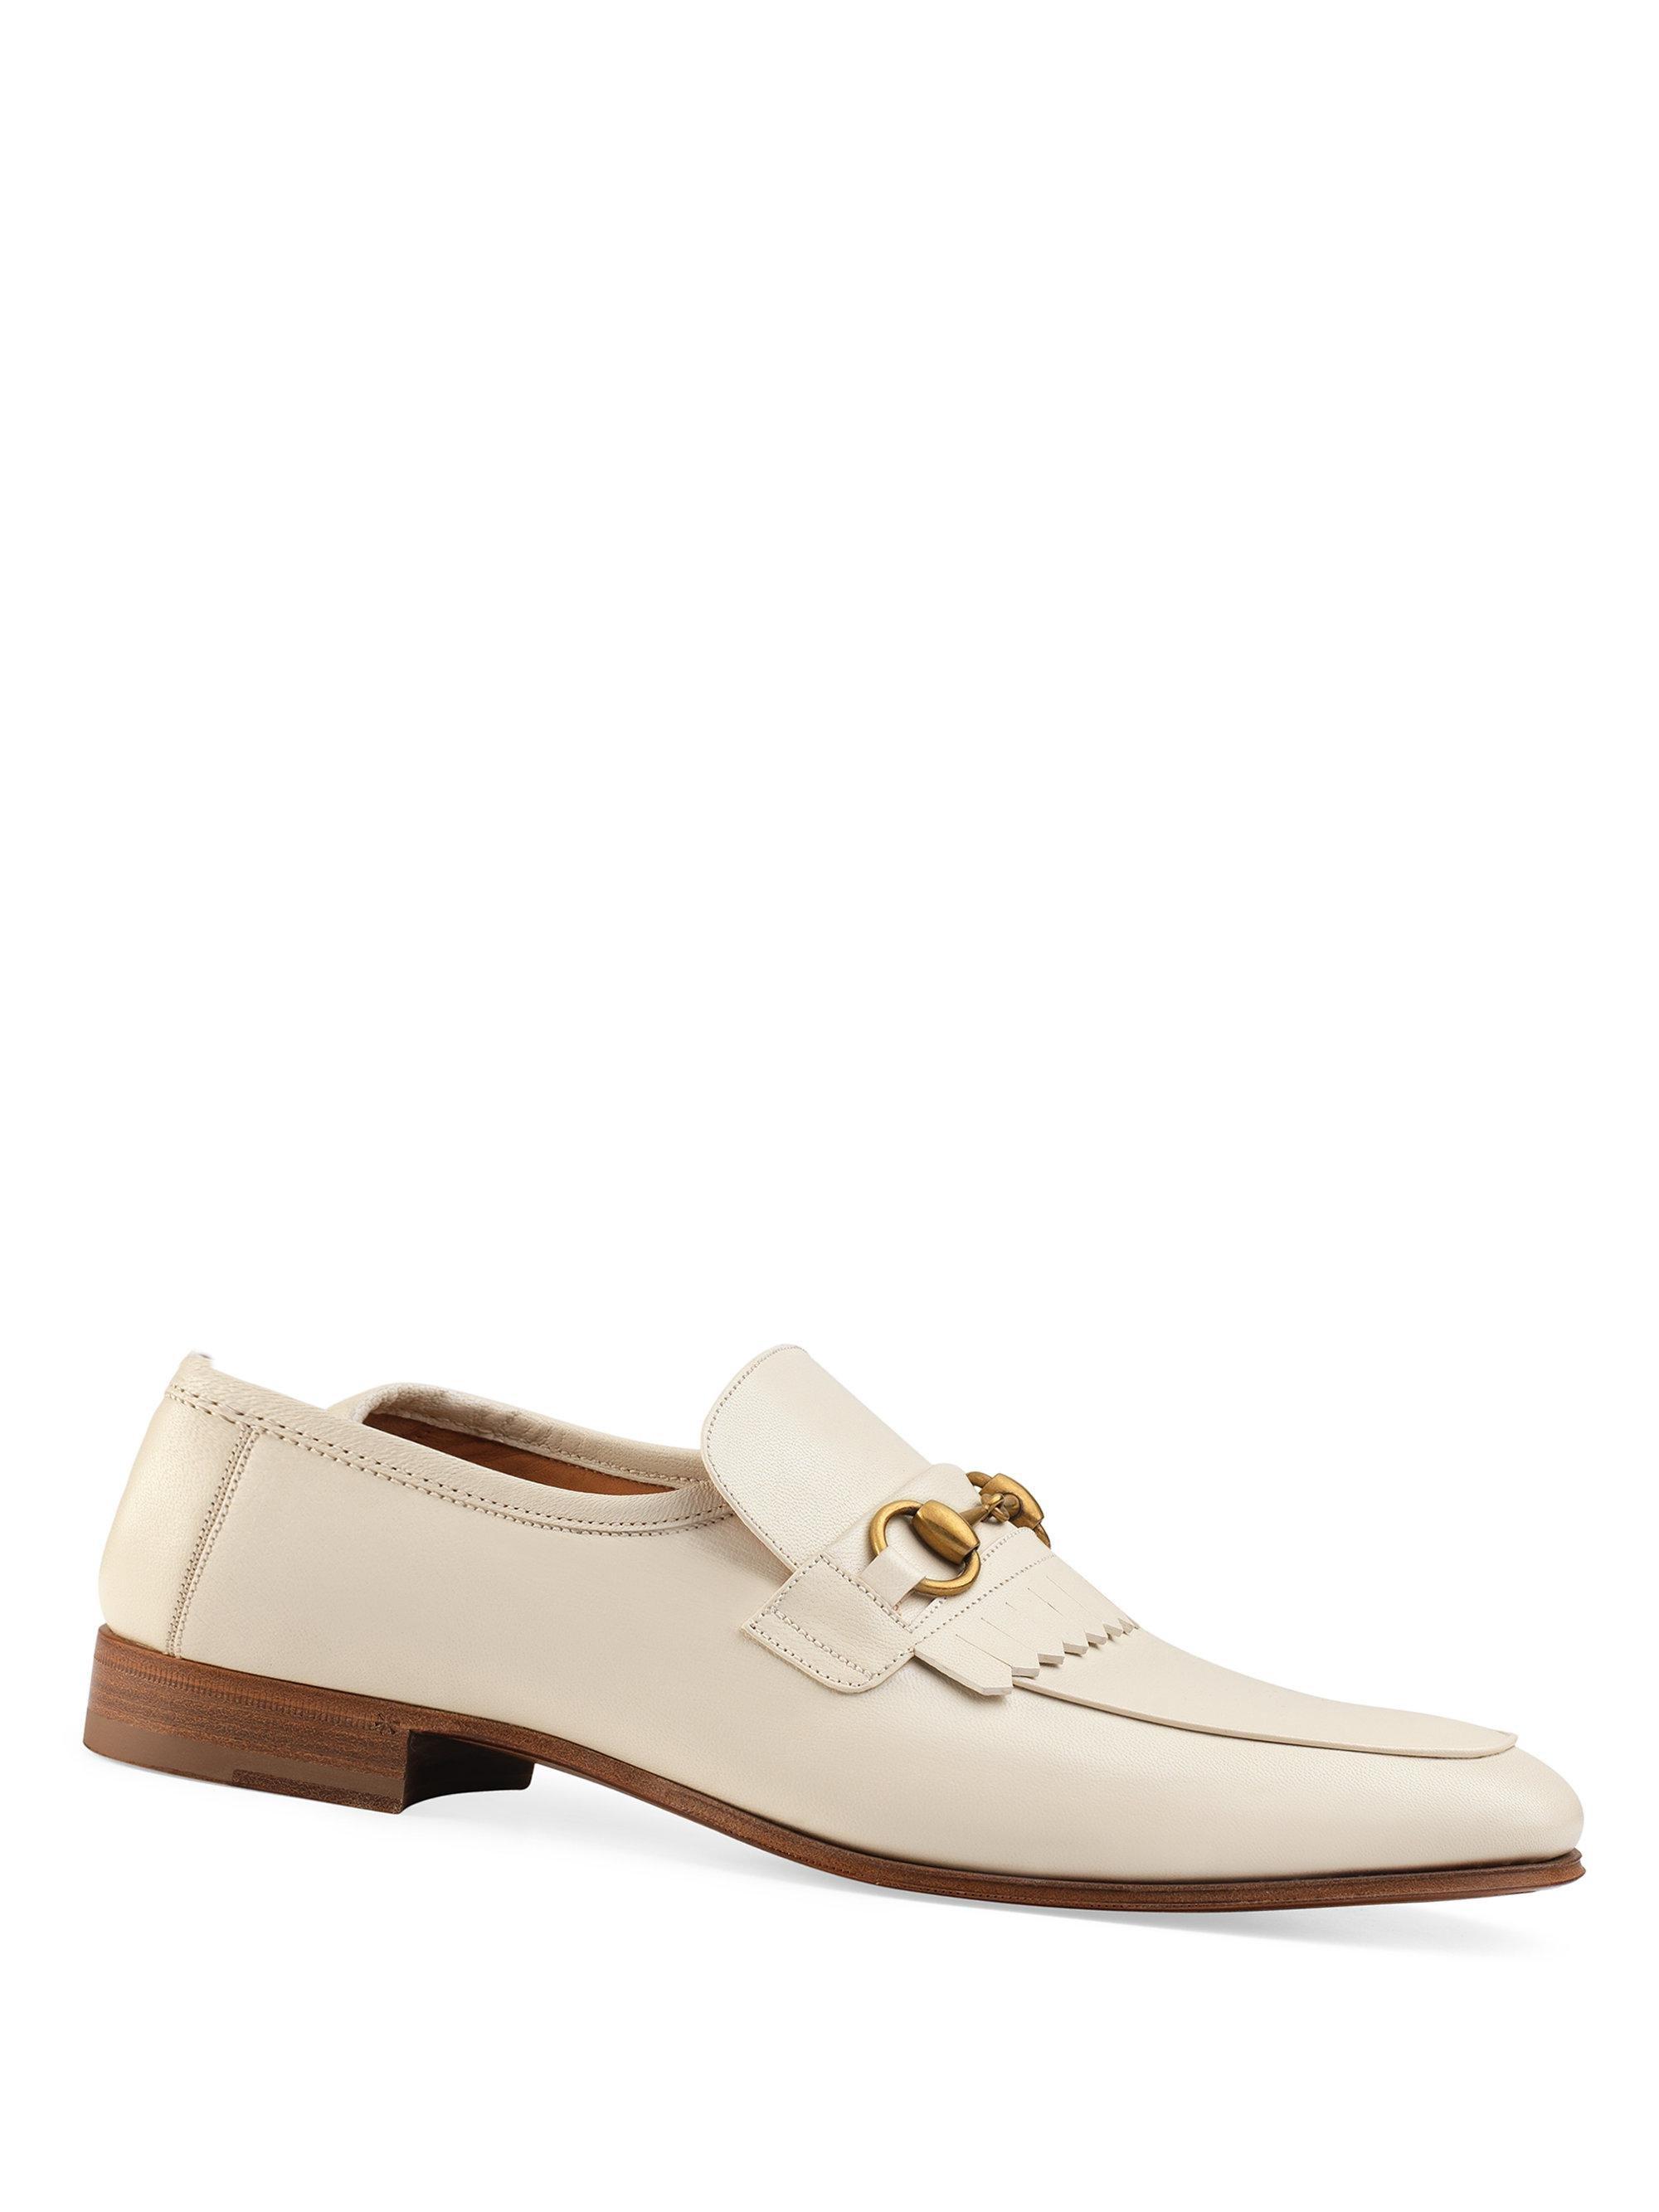 Harbor leather loafers Gucci BVtQxZMdpU